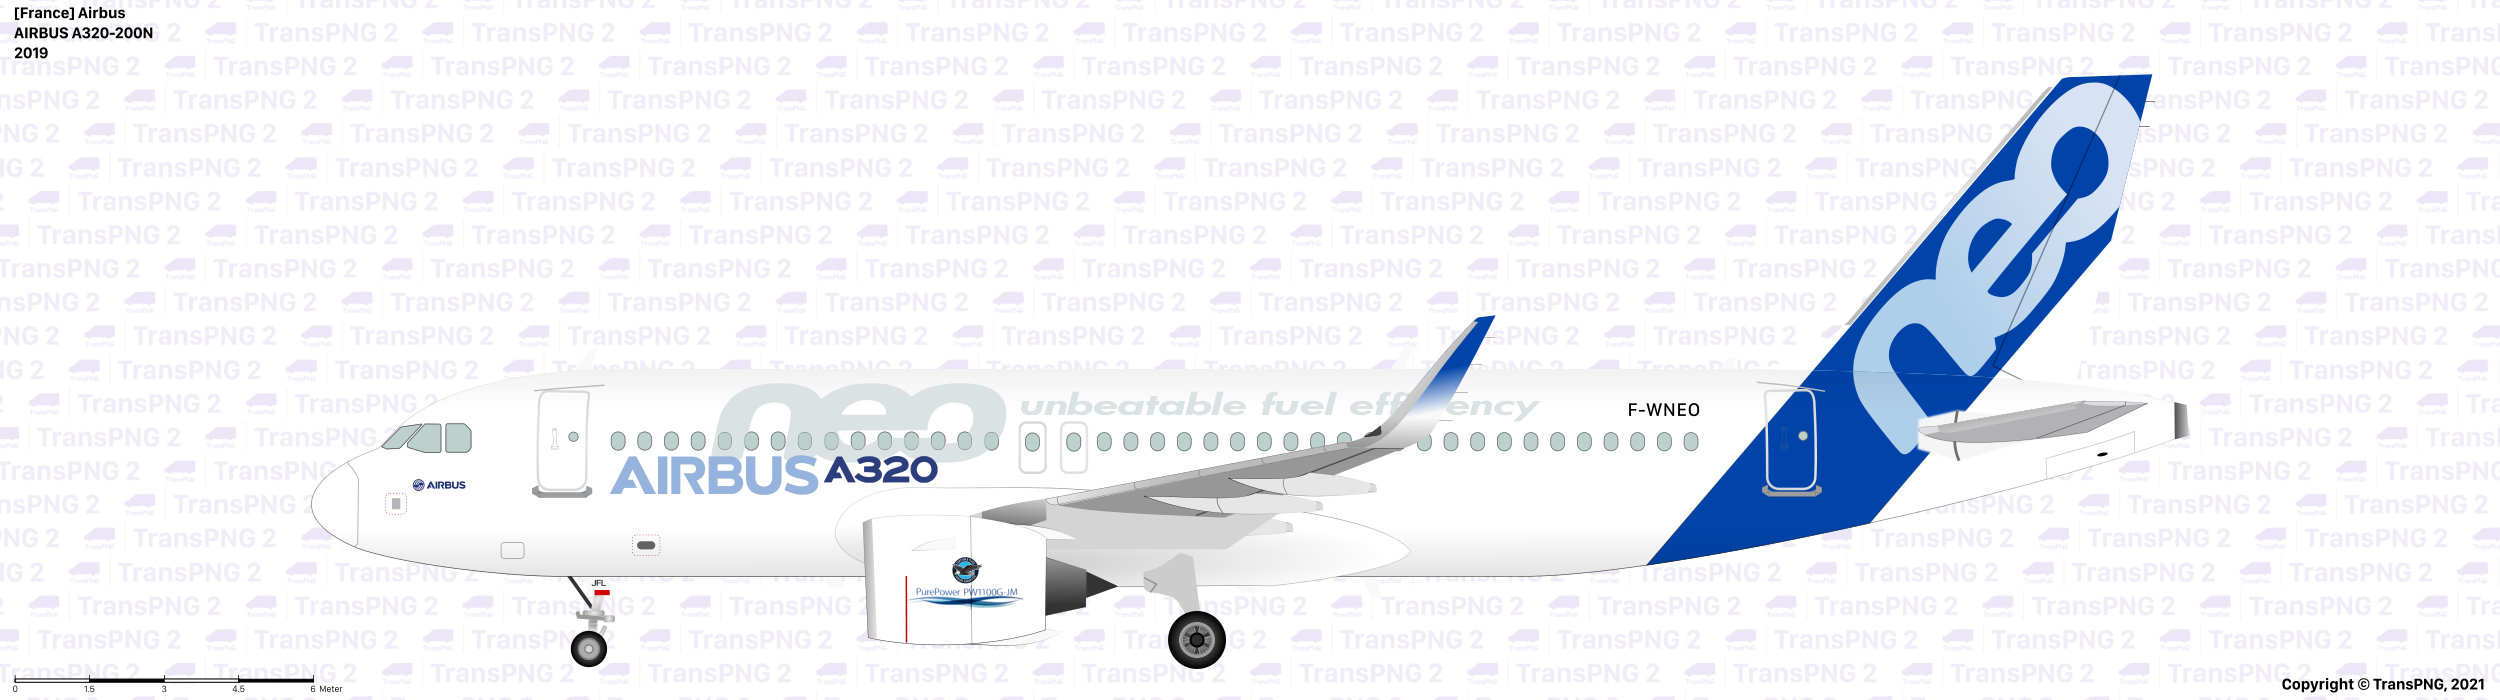 Airplane 25121